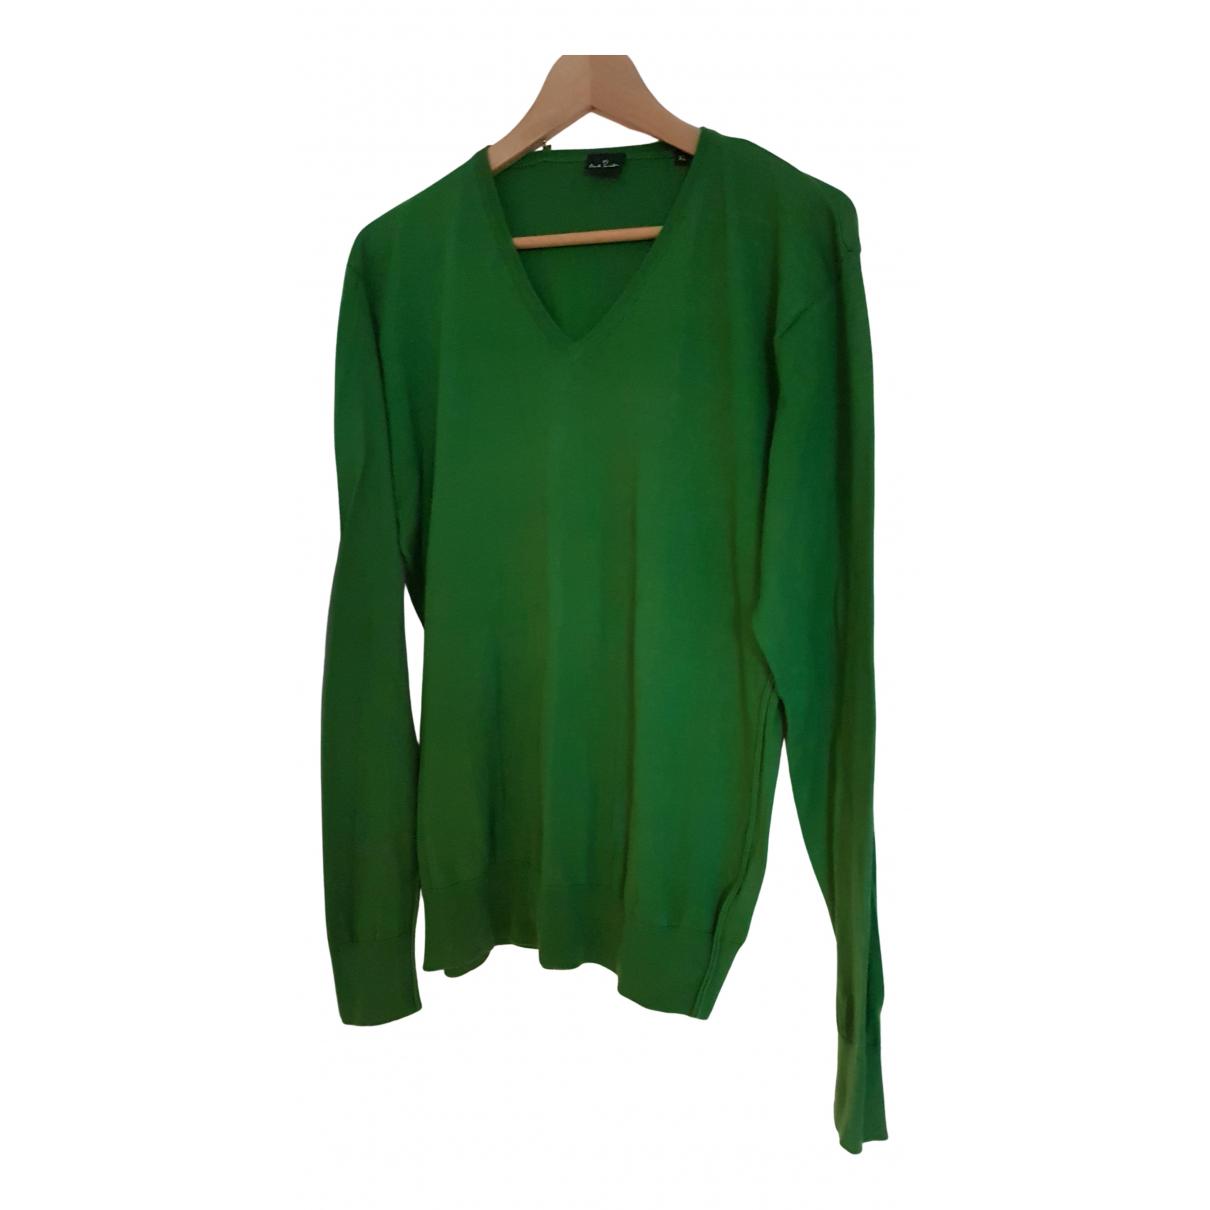 Paul Smith N Green Cotton Knitwear & Sweatshirts for Men XL International